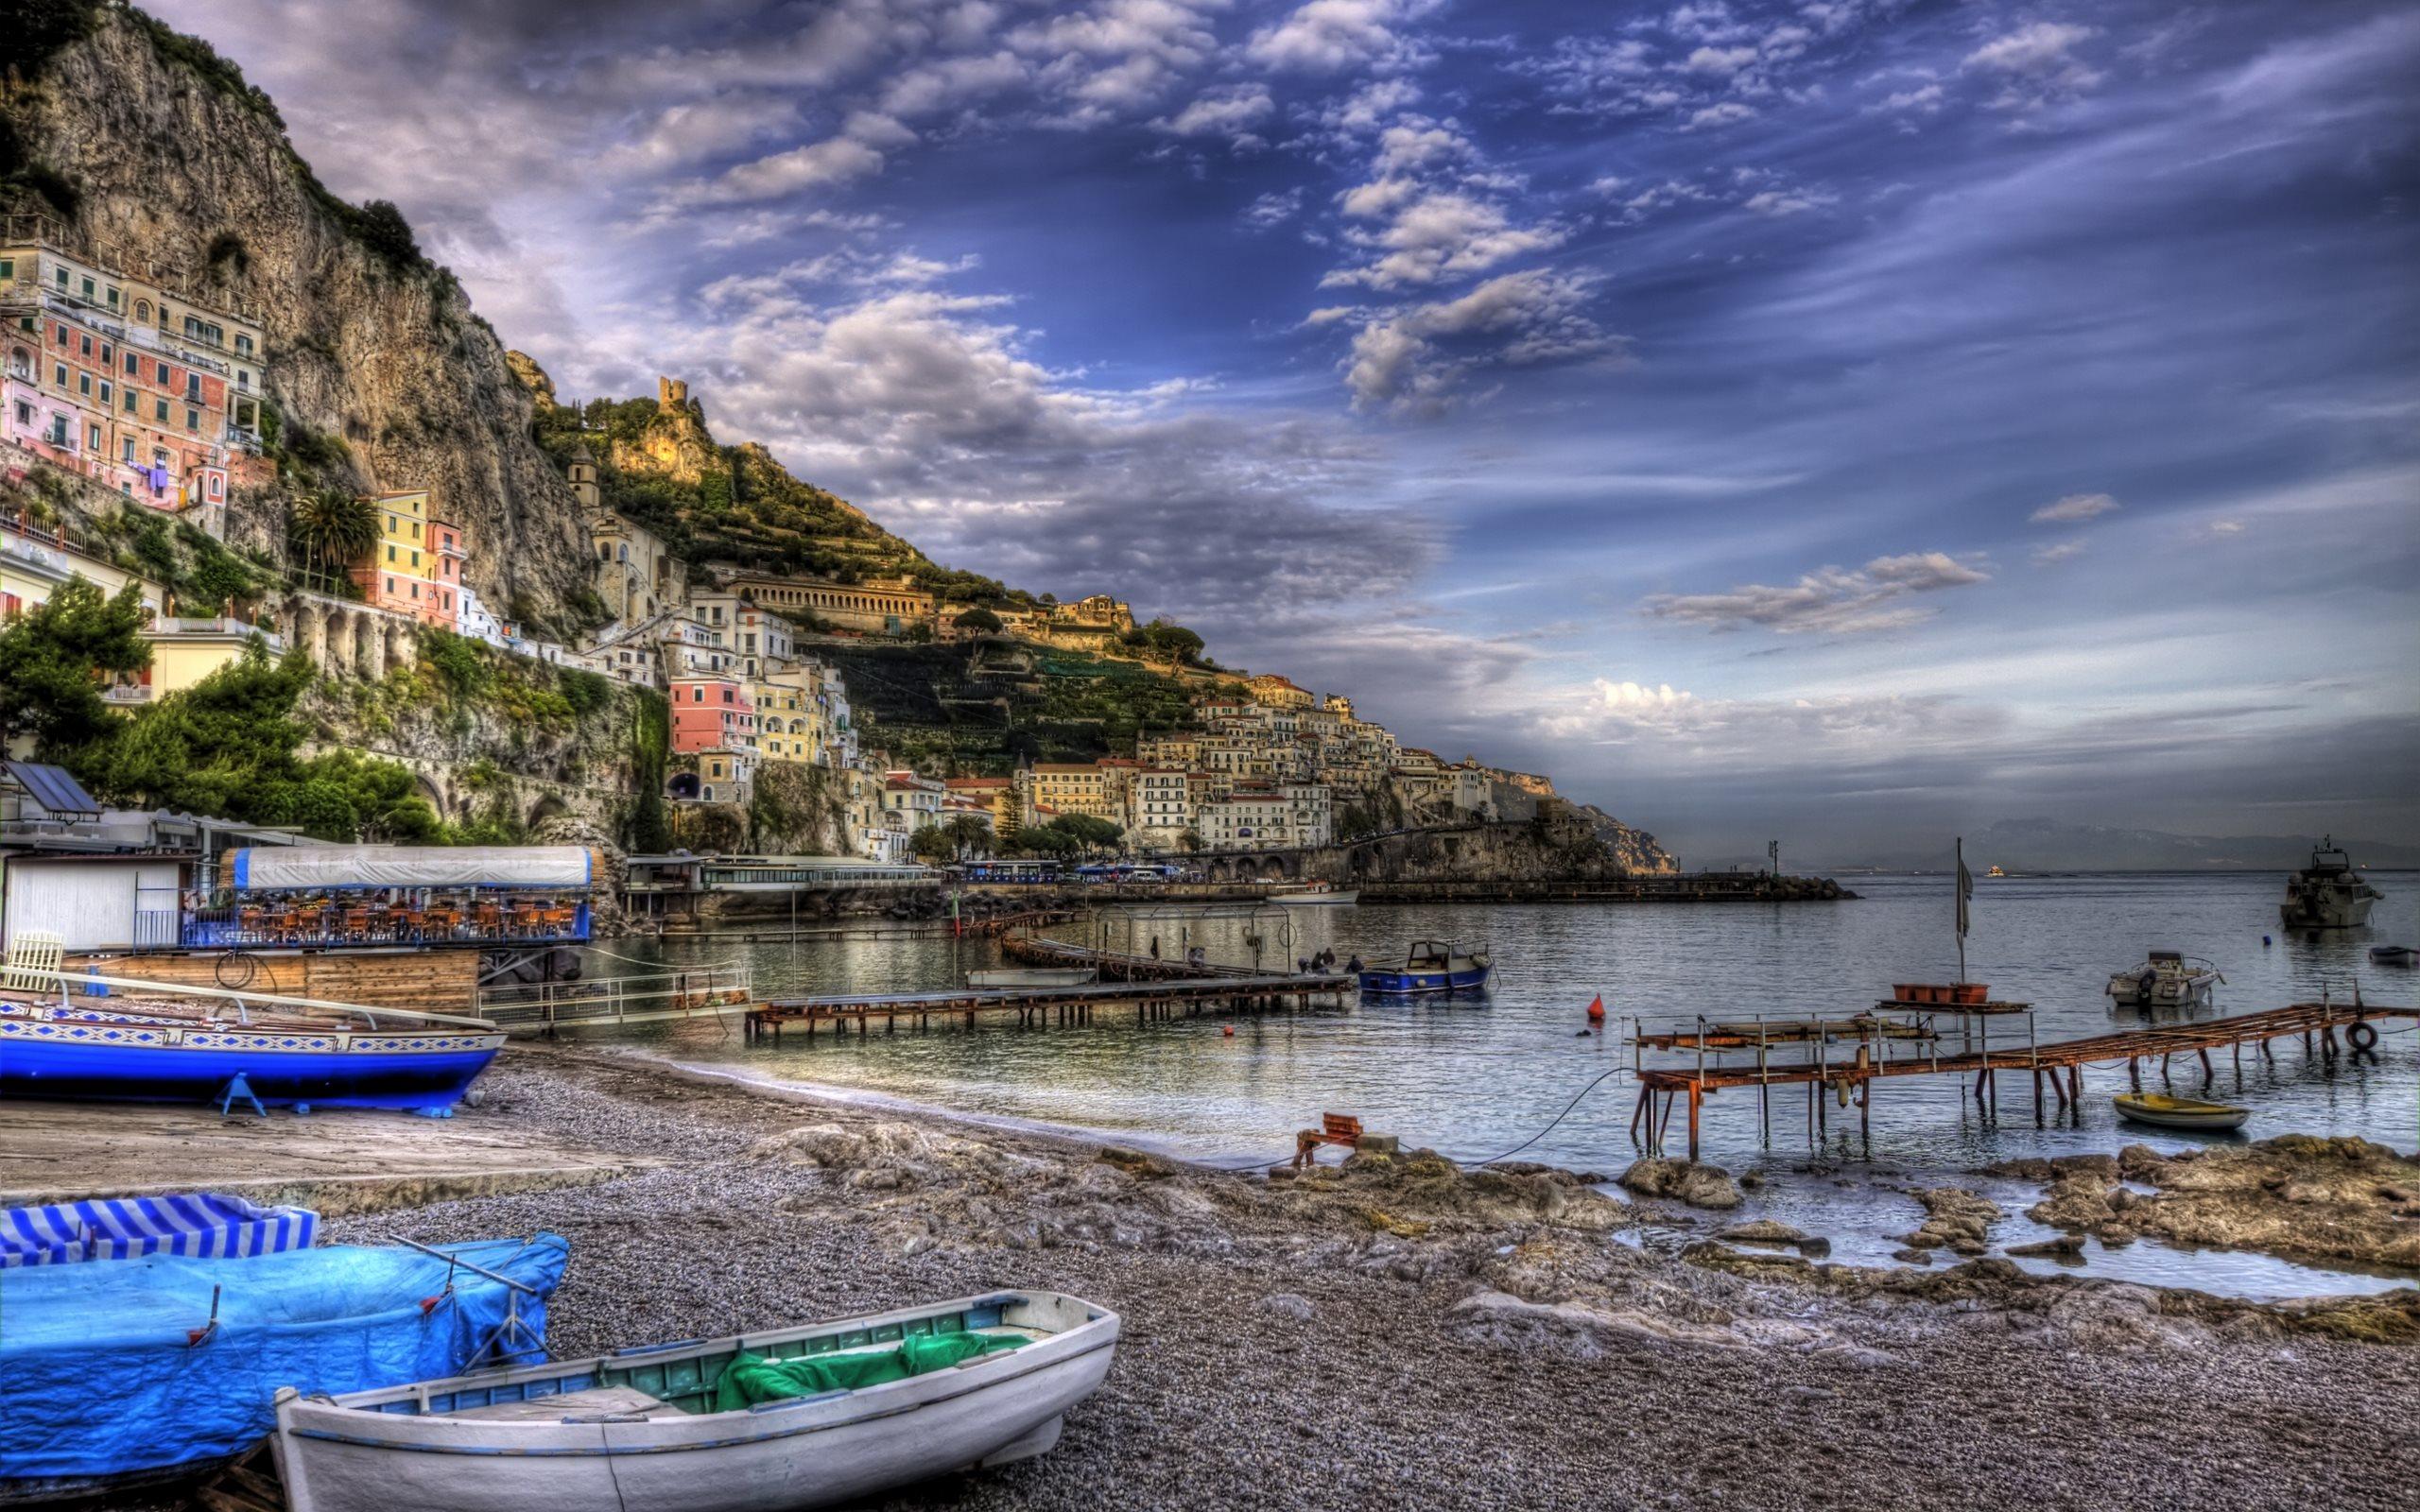 страны архитектура природа море Италия без смс